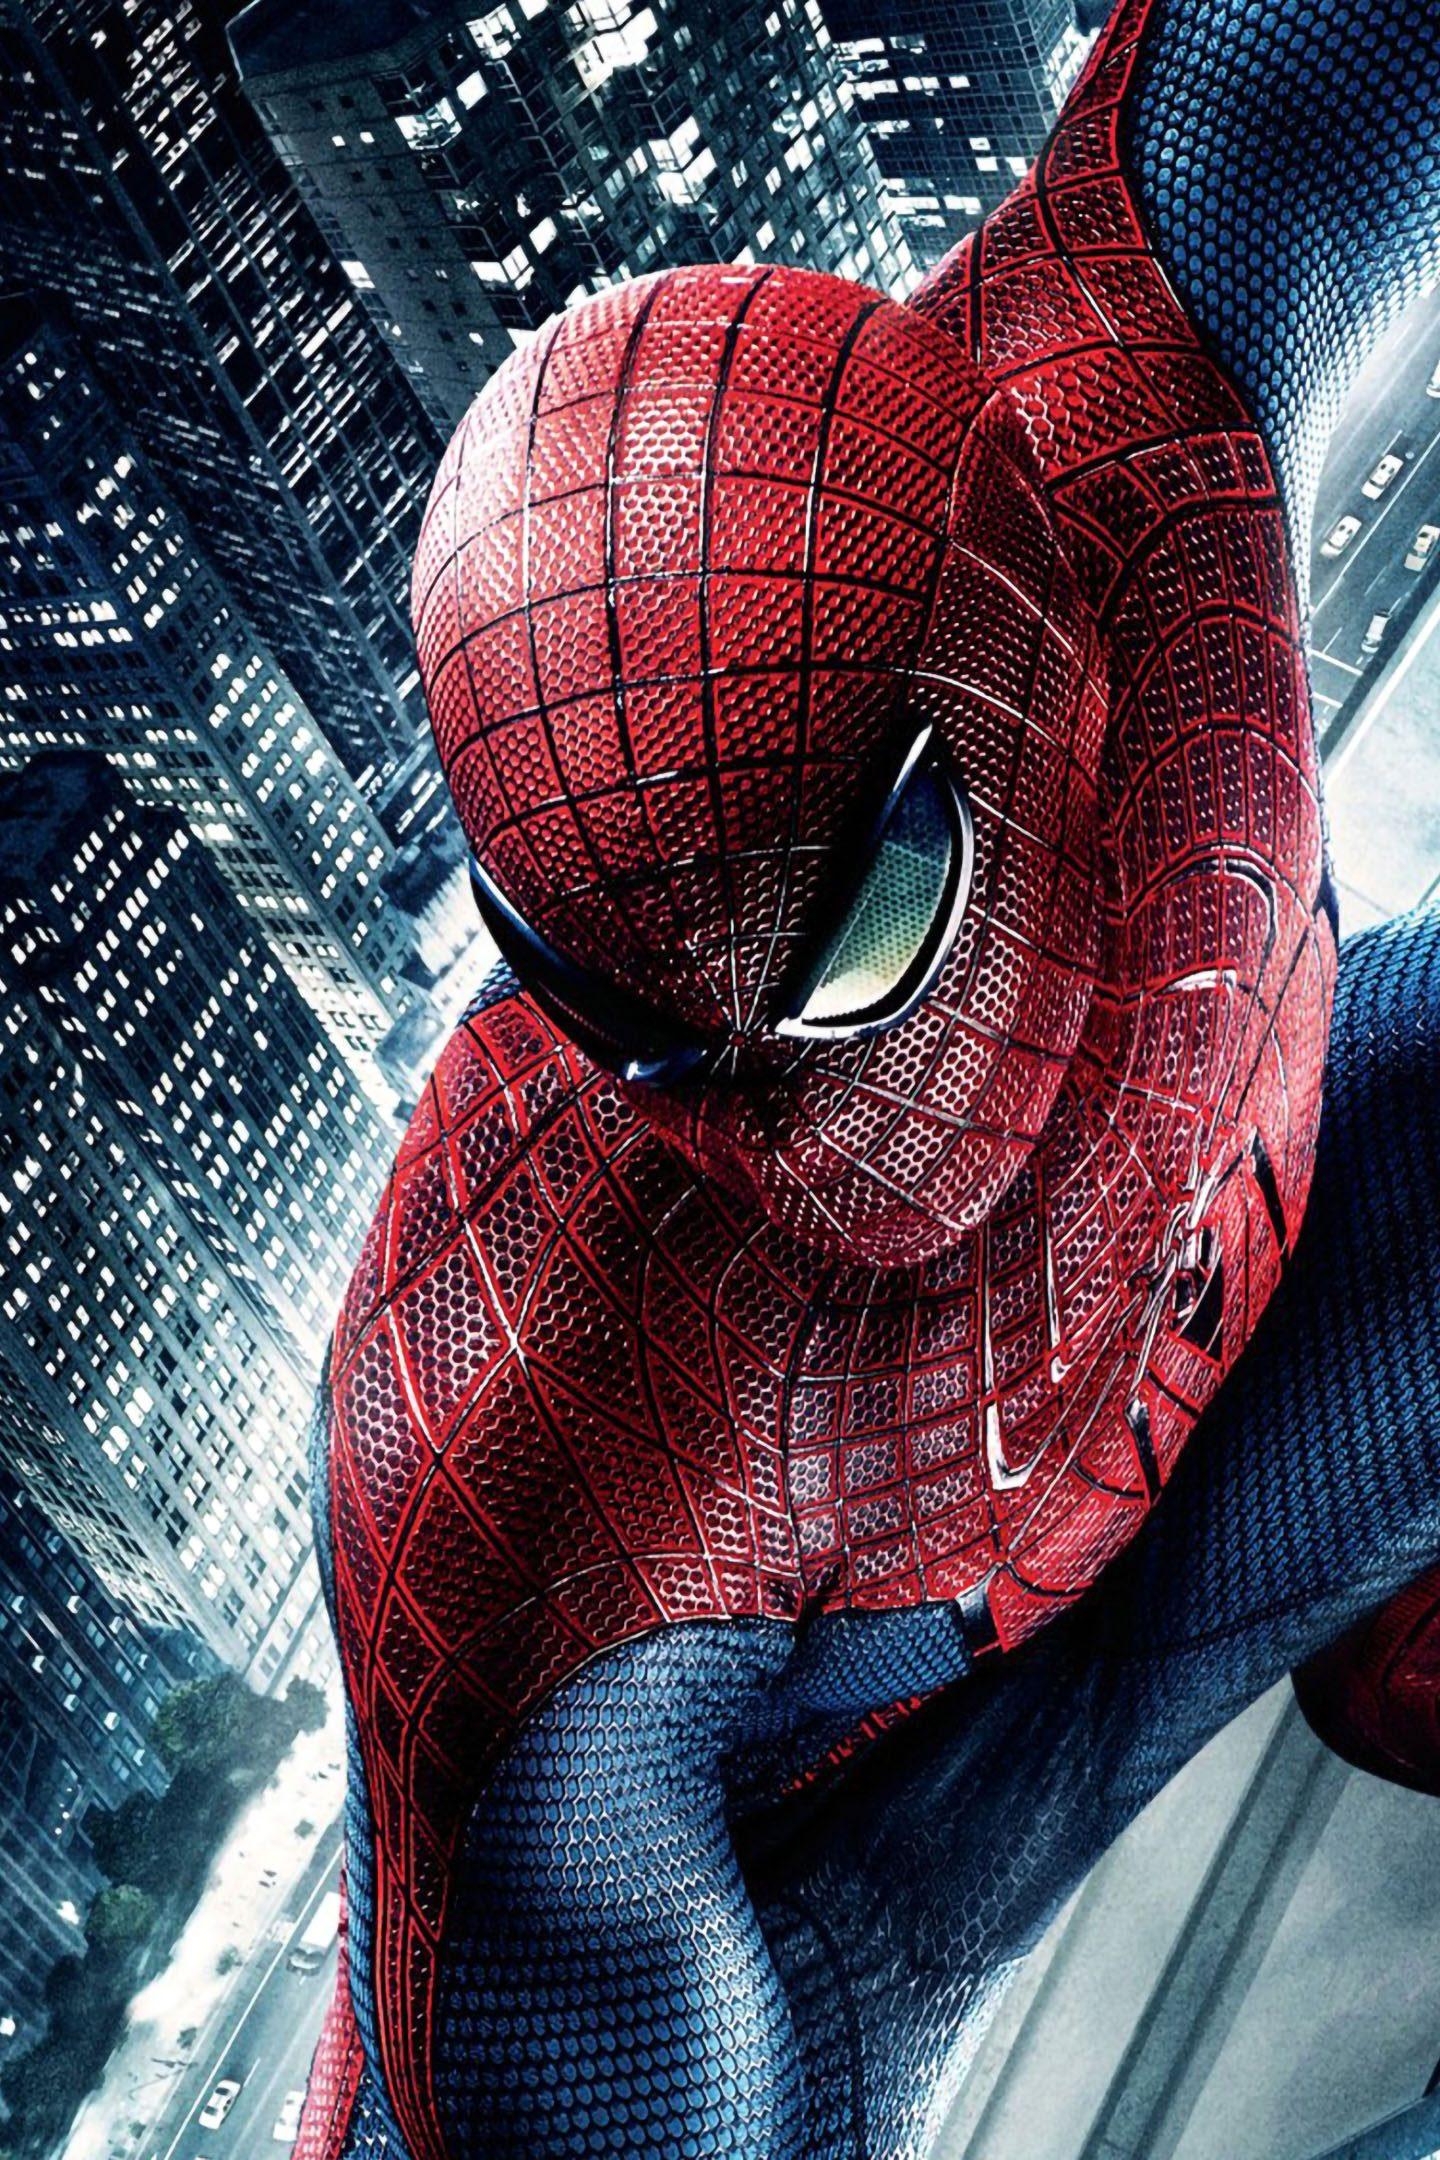 The Amazing Spiderman Movie Poster 4K Wallpaper